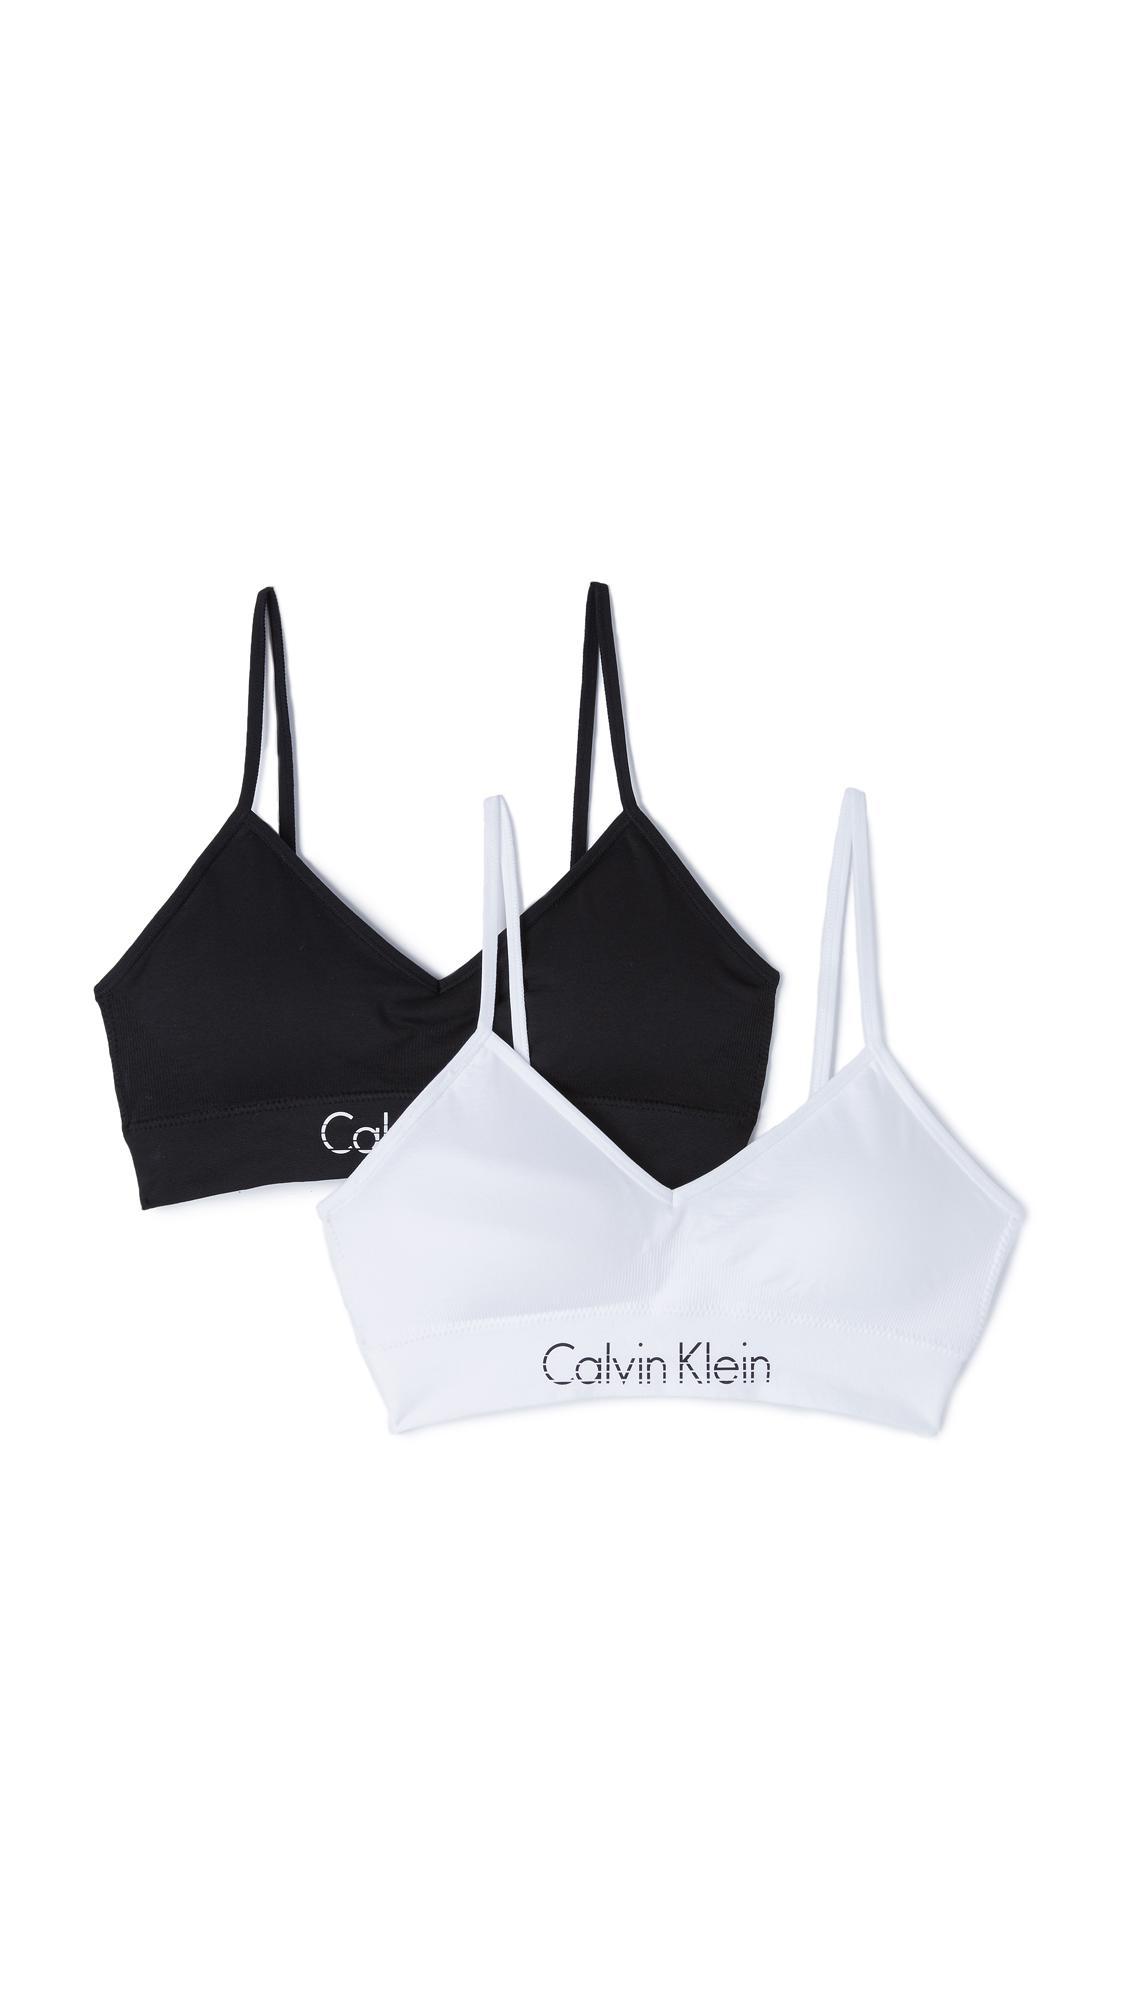 784bc6e026db42 Lyst - Calvin Klein Horizon Bralette 2 Pack in White